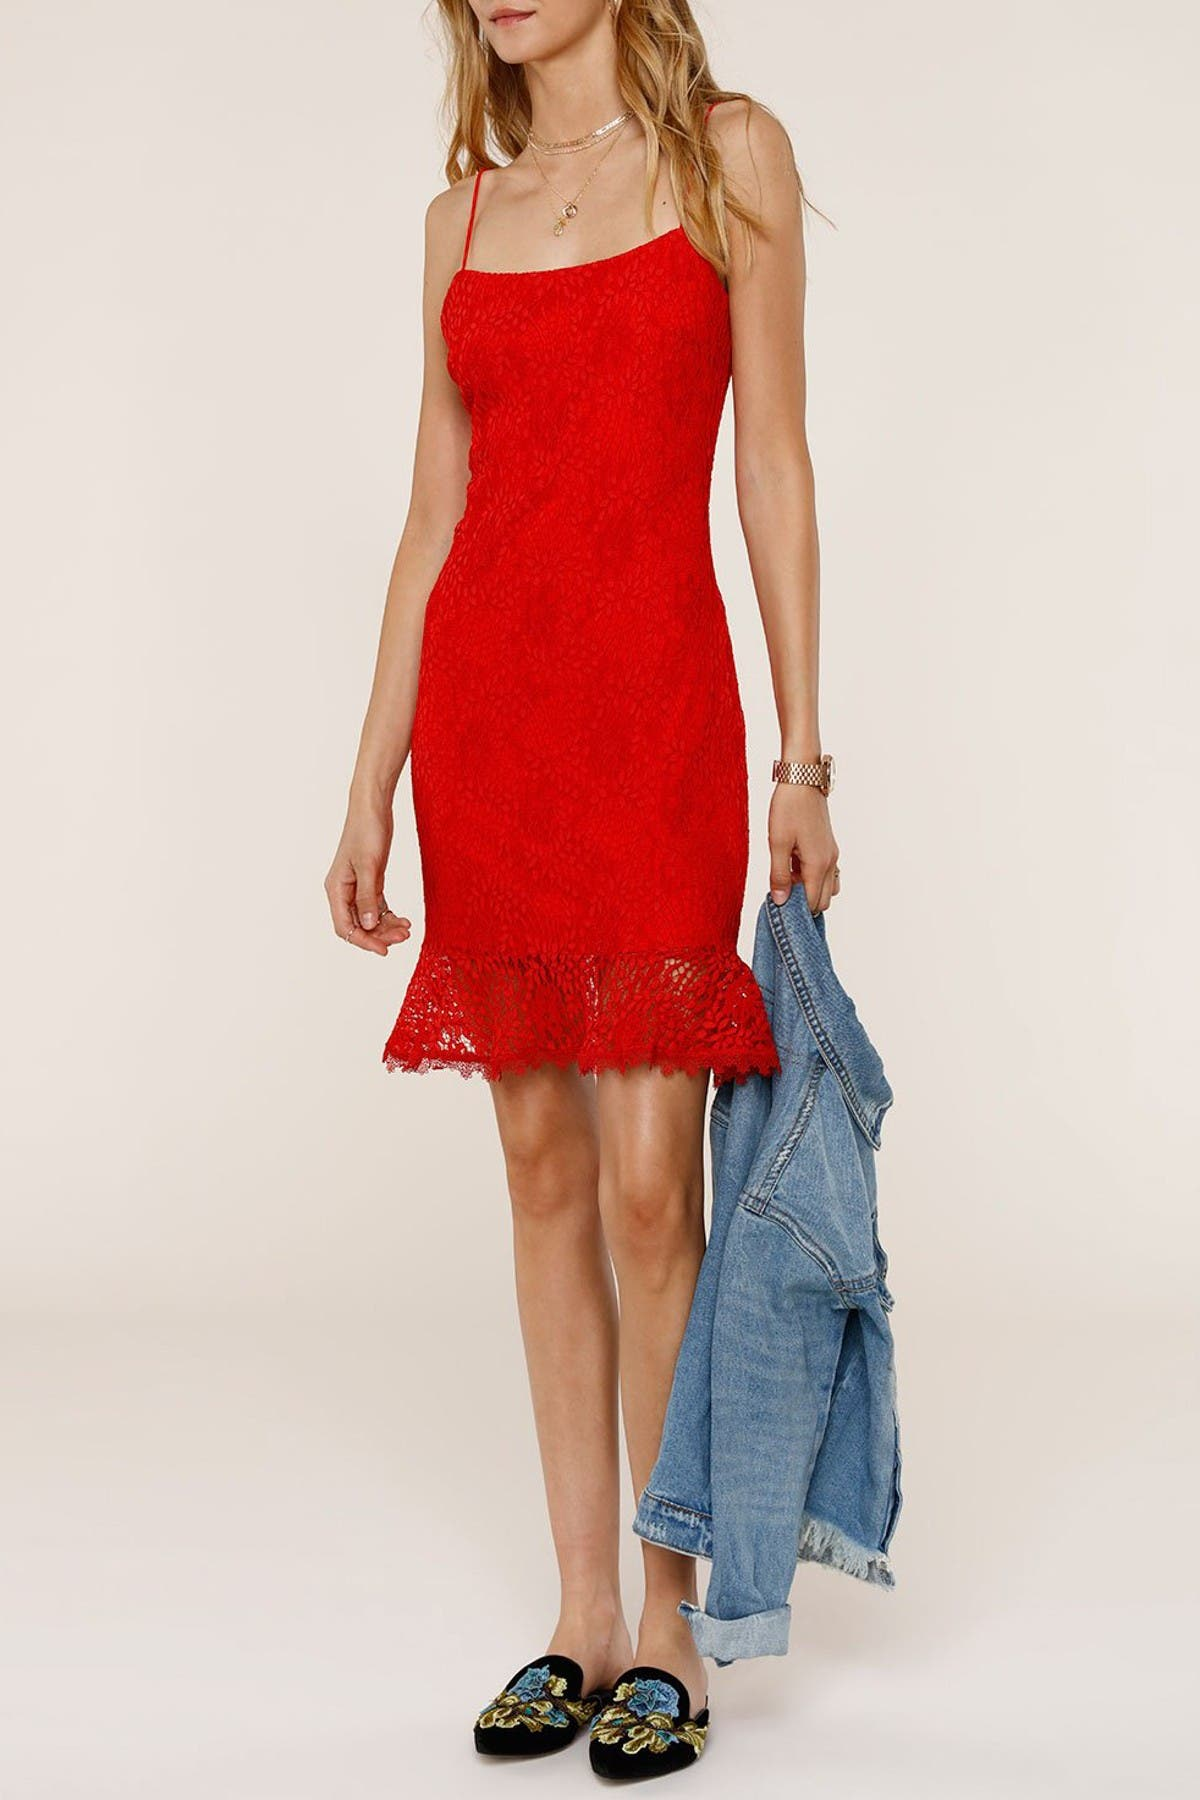 Image of Heartloom Nessa Ruffle Hem Lace Dress